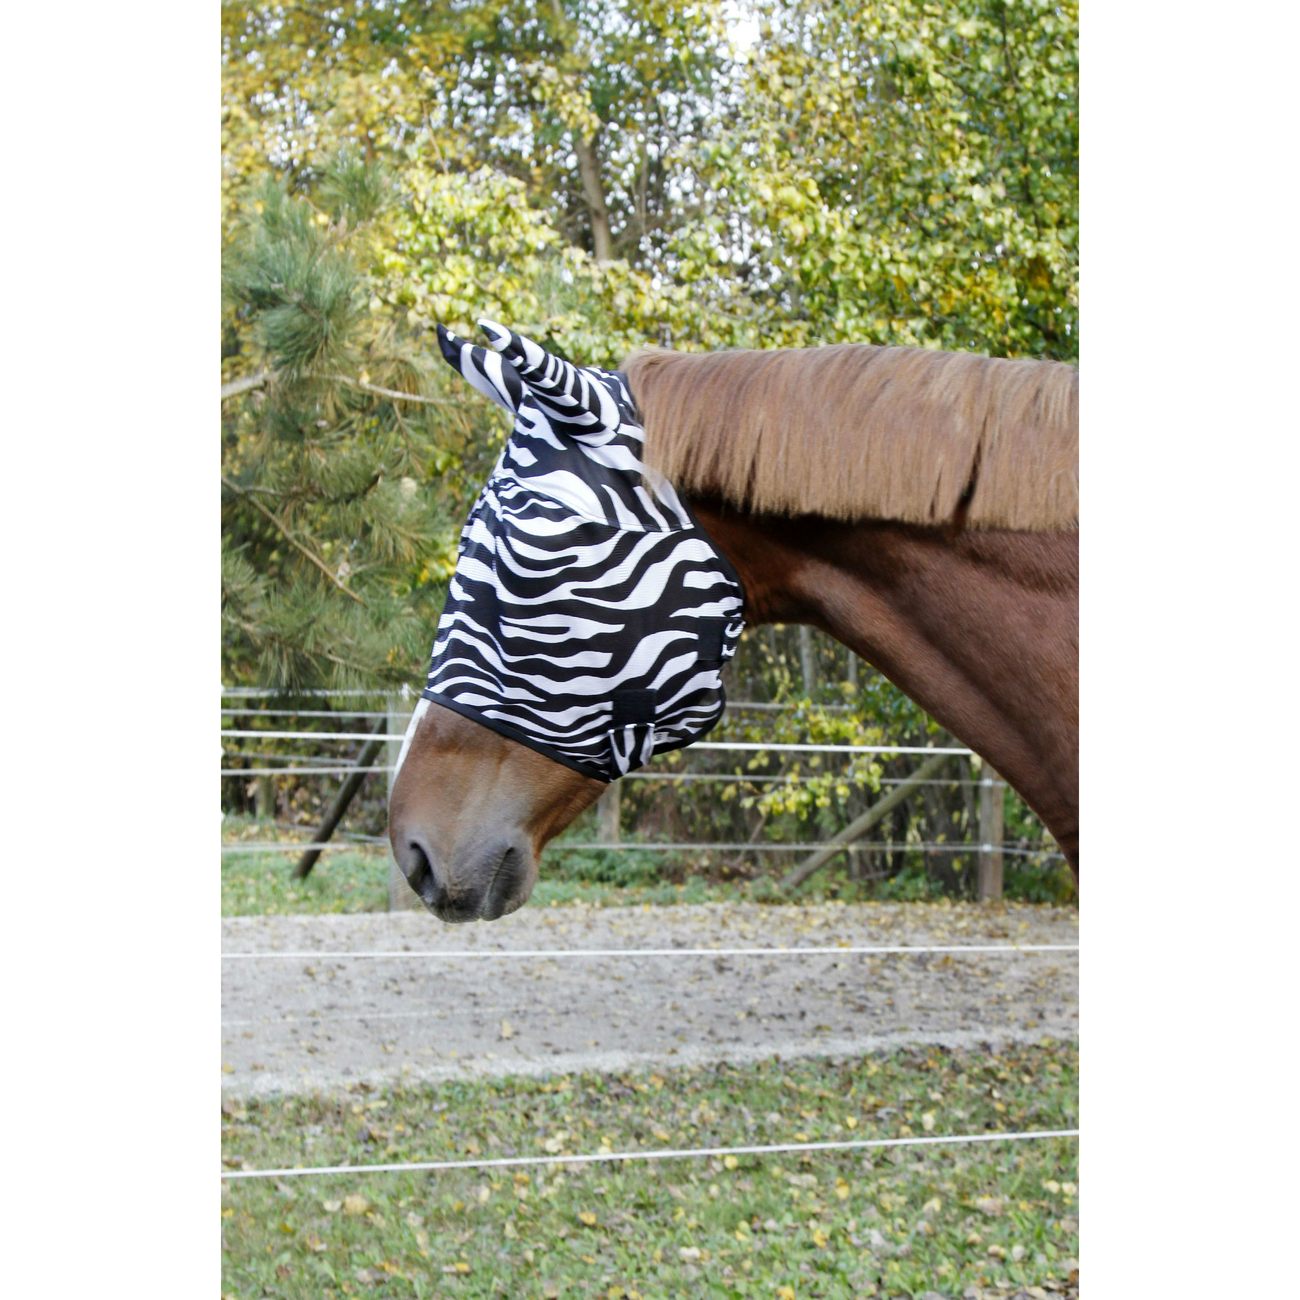 Kerbl Pferde Fliegenschutzmaske Zebra incl. Ohrenschutz, Bild 2